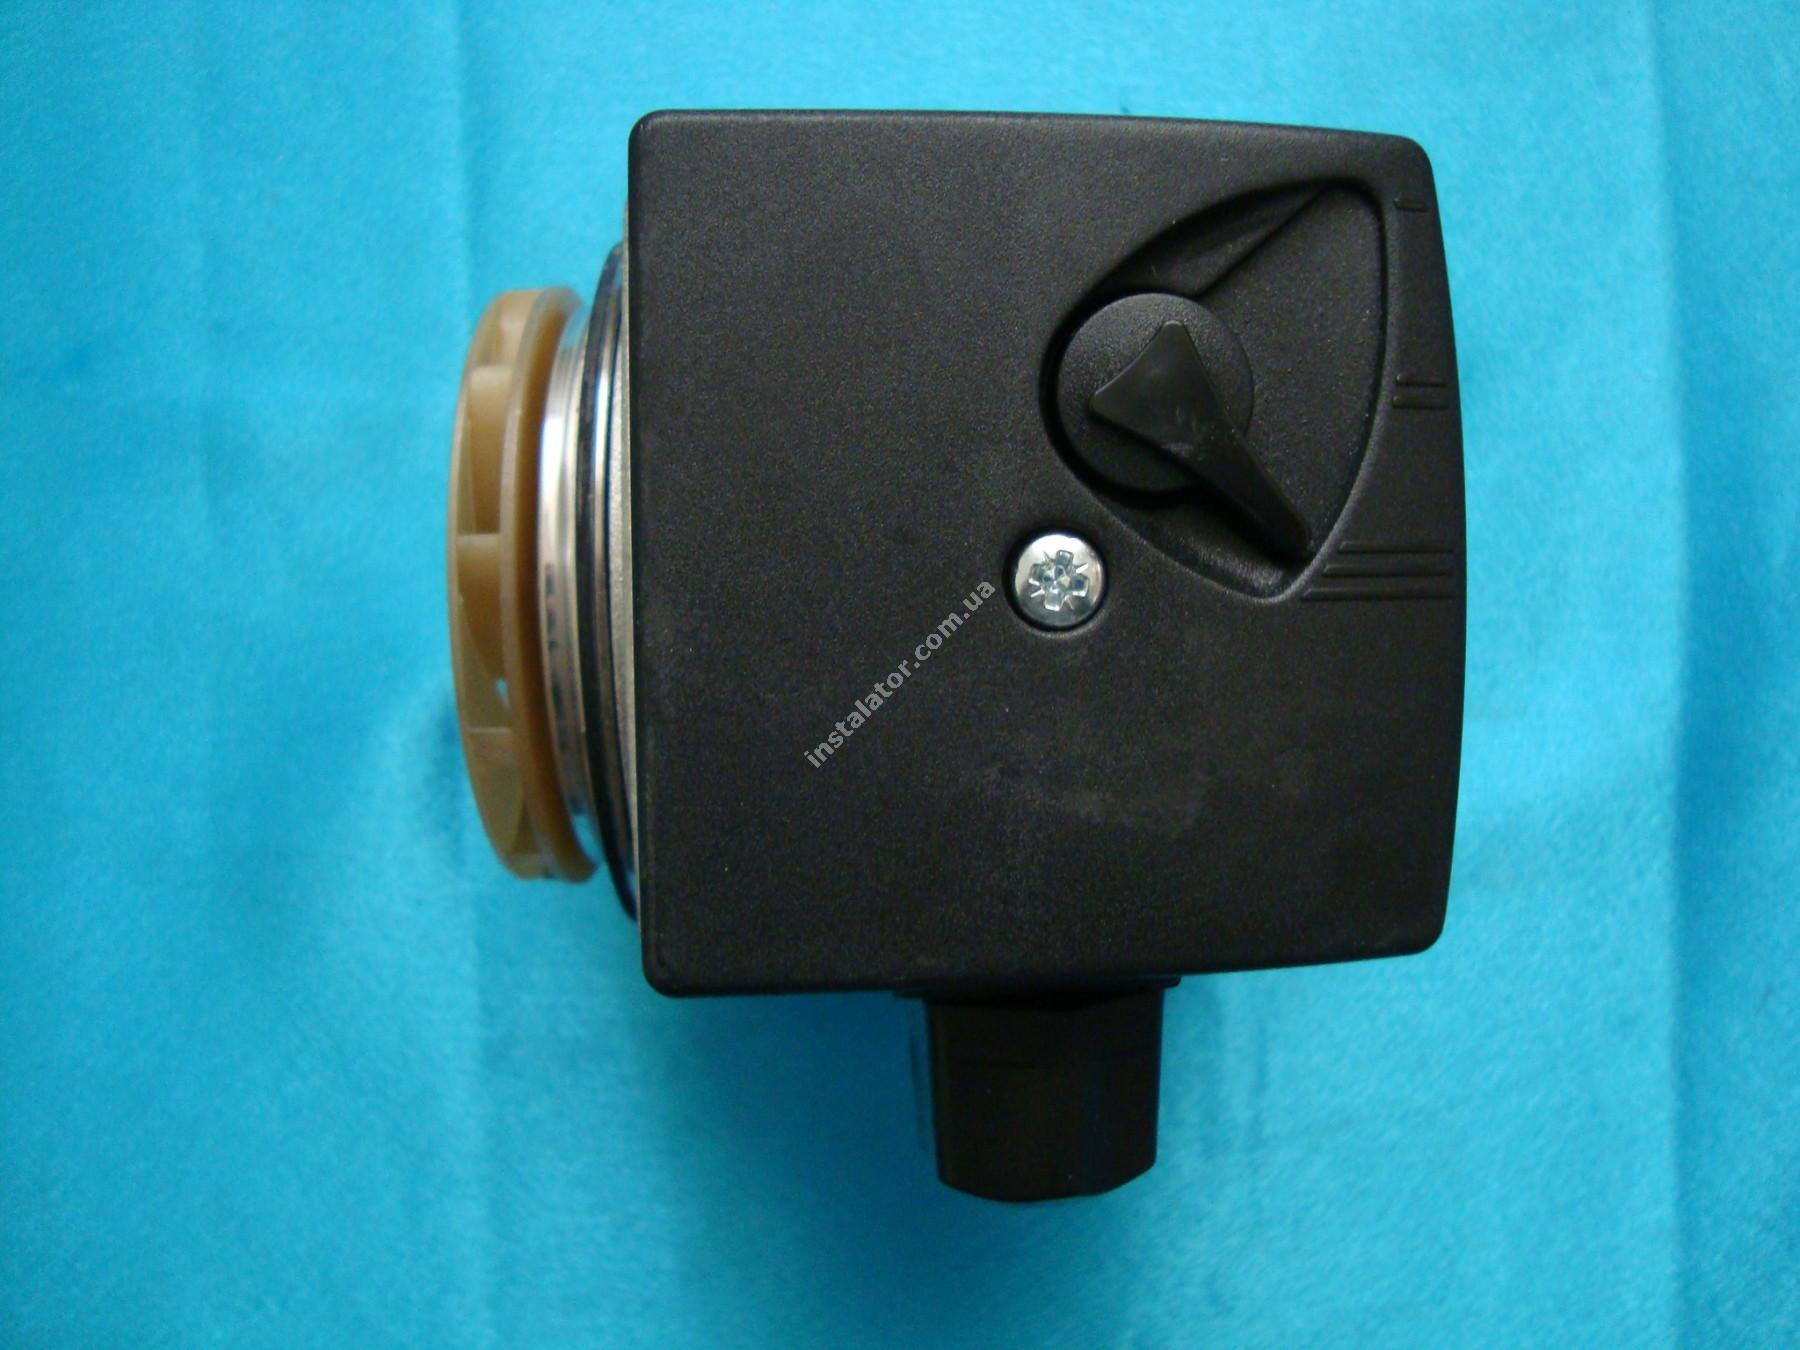 150100102 Циркуляційний насос Grundfos UPS 25-60 (база 130) full-image-3